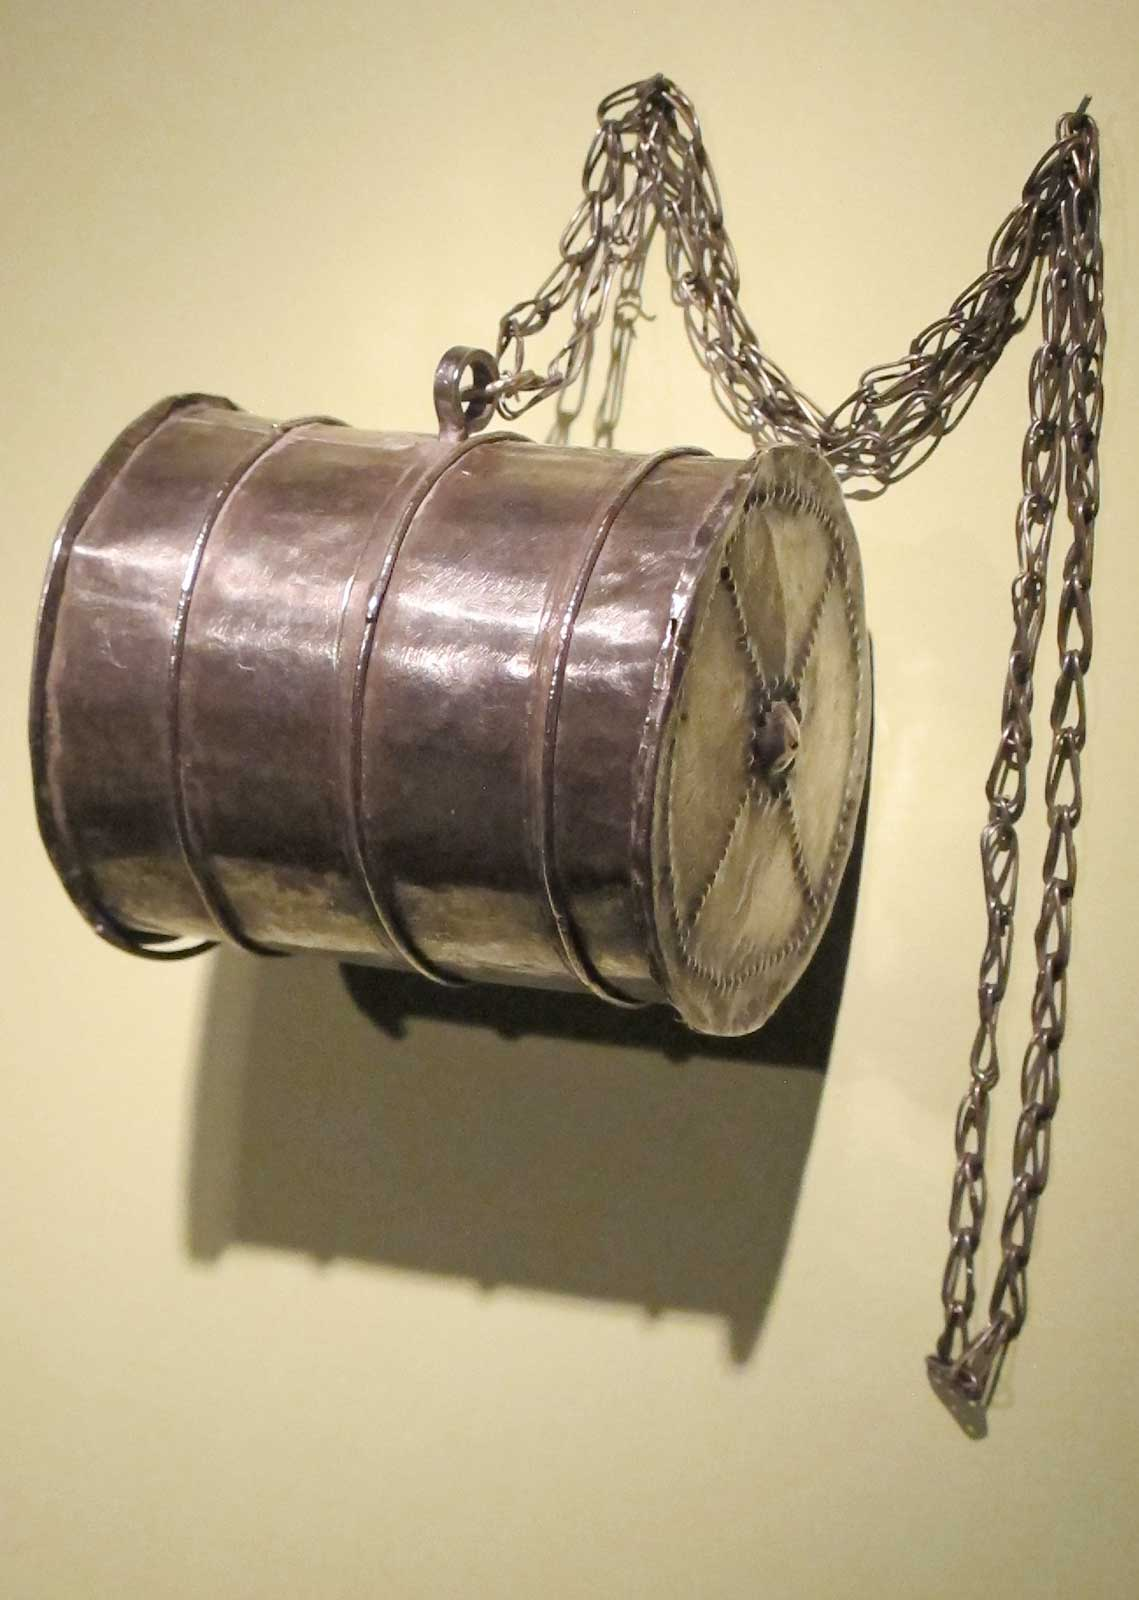 Barrel-shaped pendant by Mende artist, Sierra Leone, of metal, early 20th century.